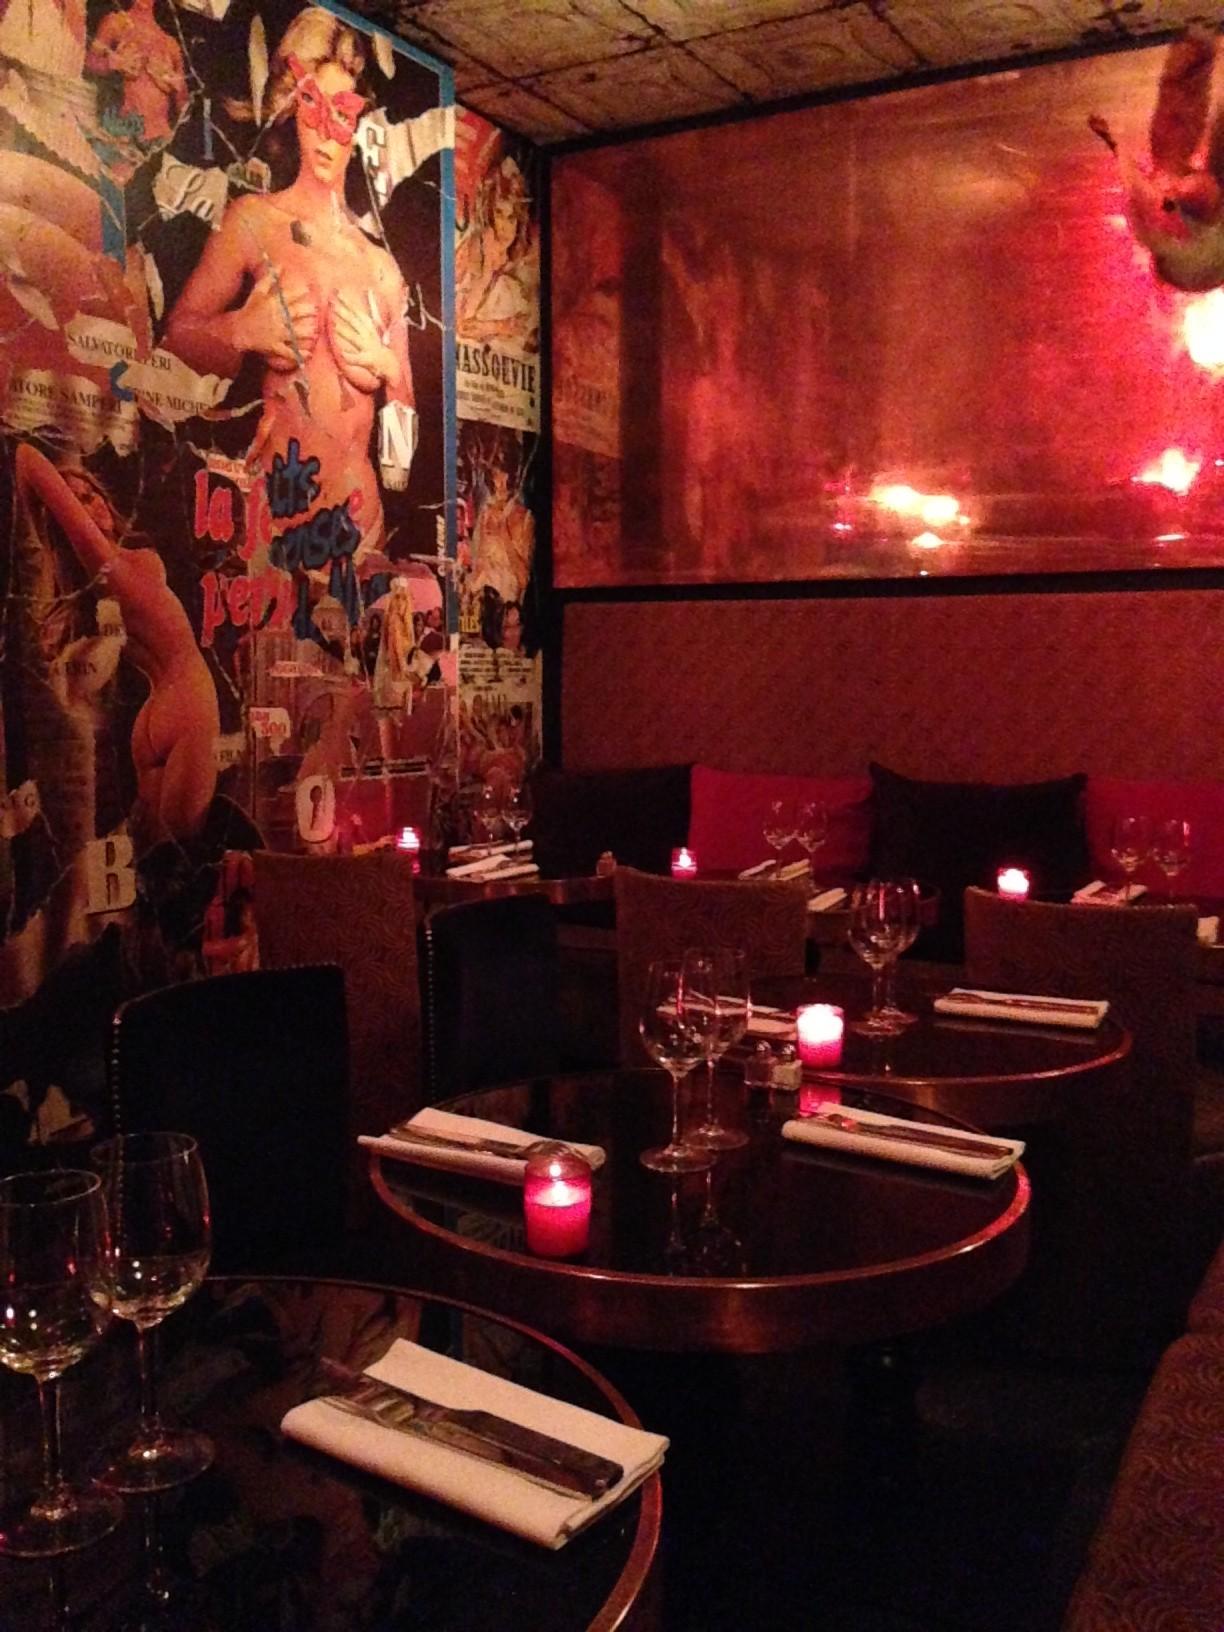 La Fourbi, Cocktail tapas bar in Paris